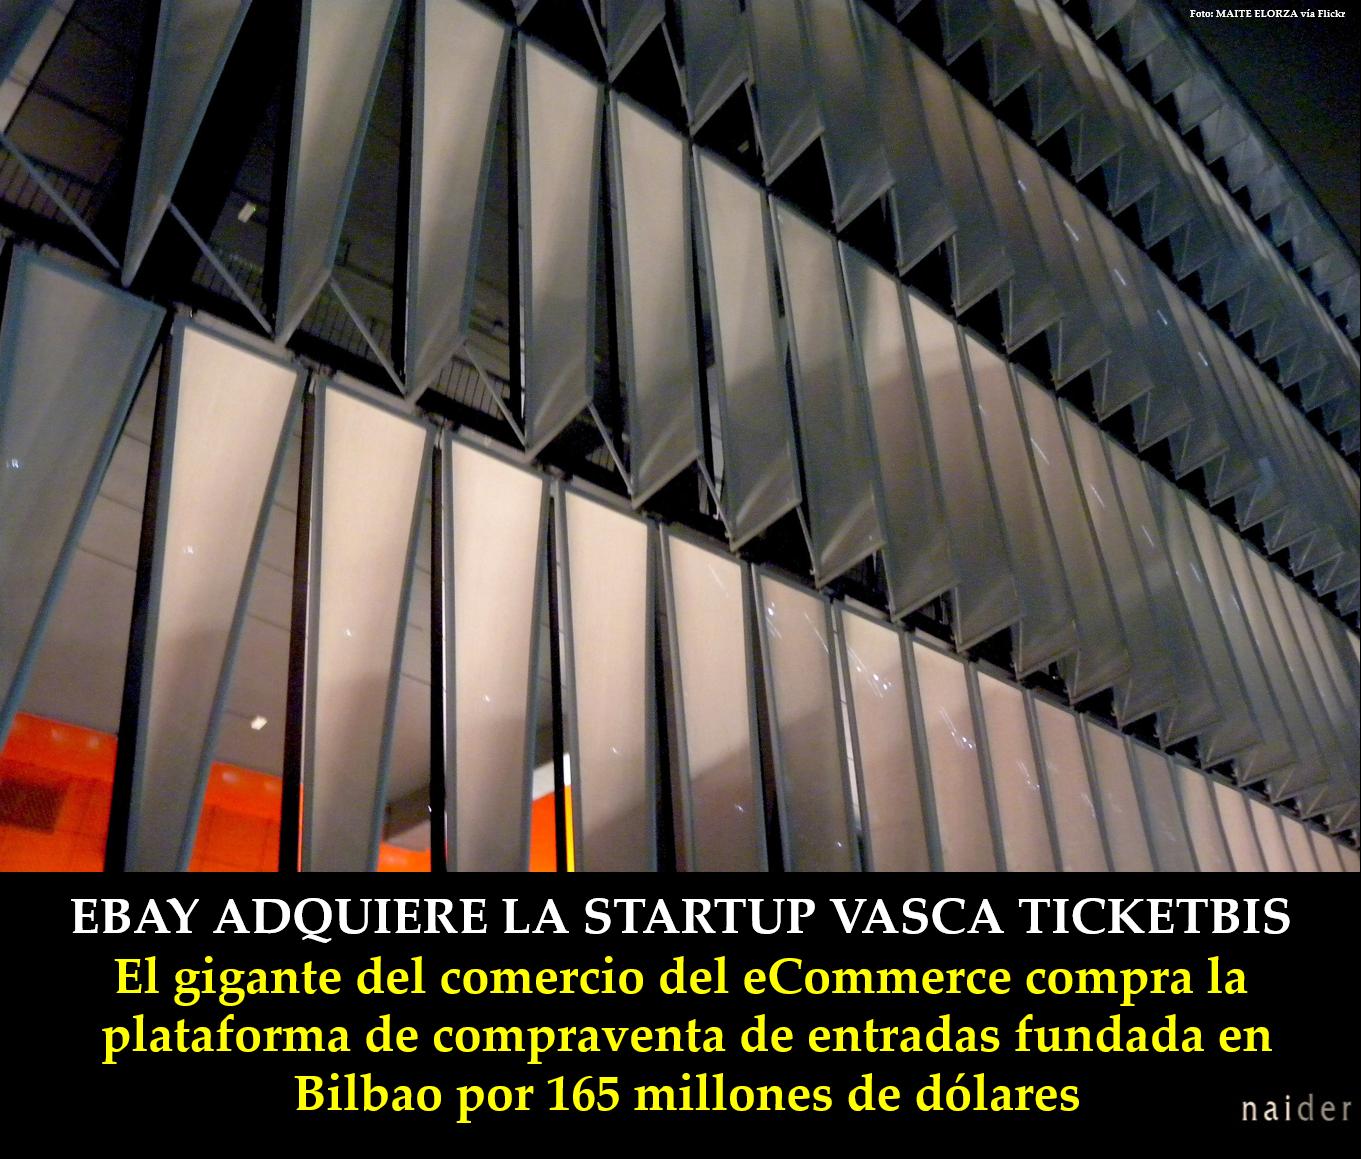 ebay adquiere la startup vasca ticketbis infopost